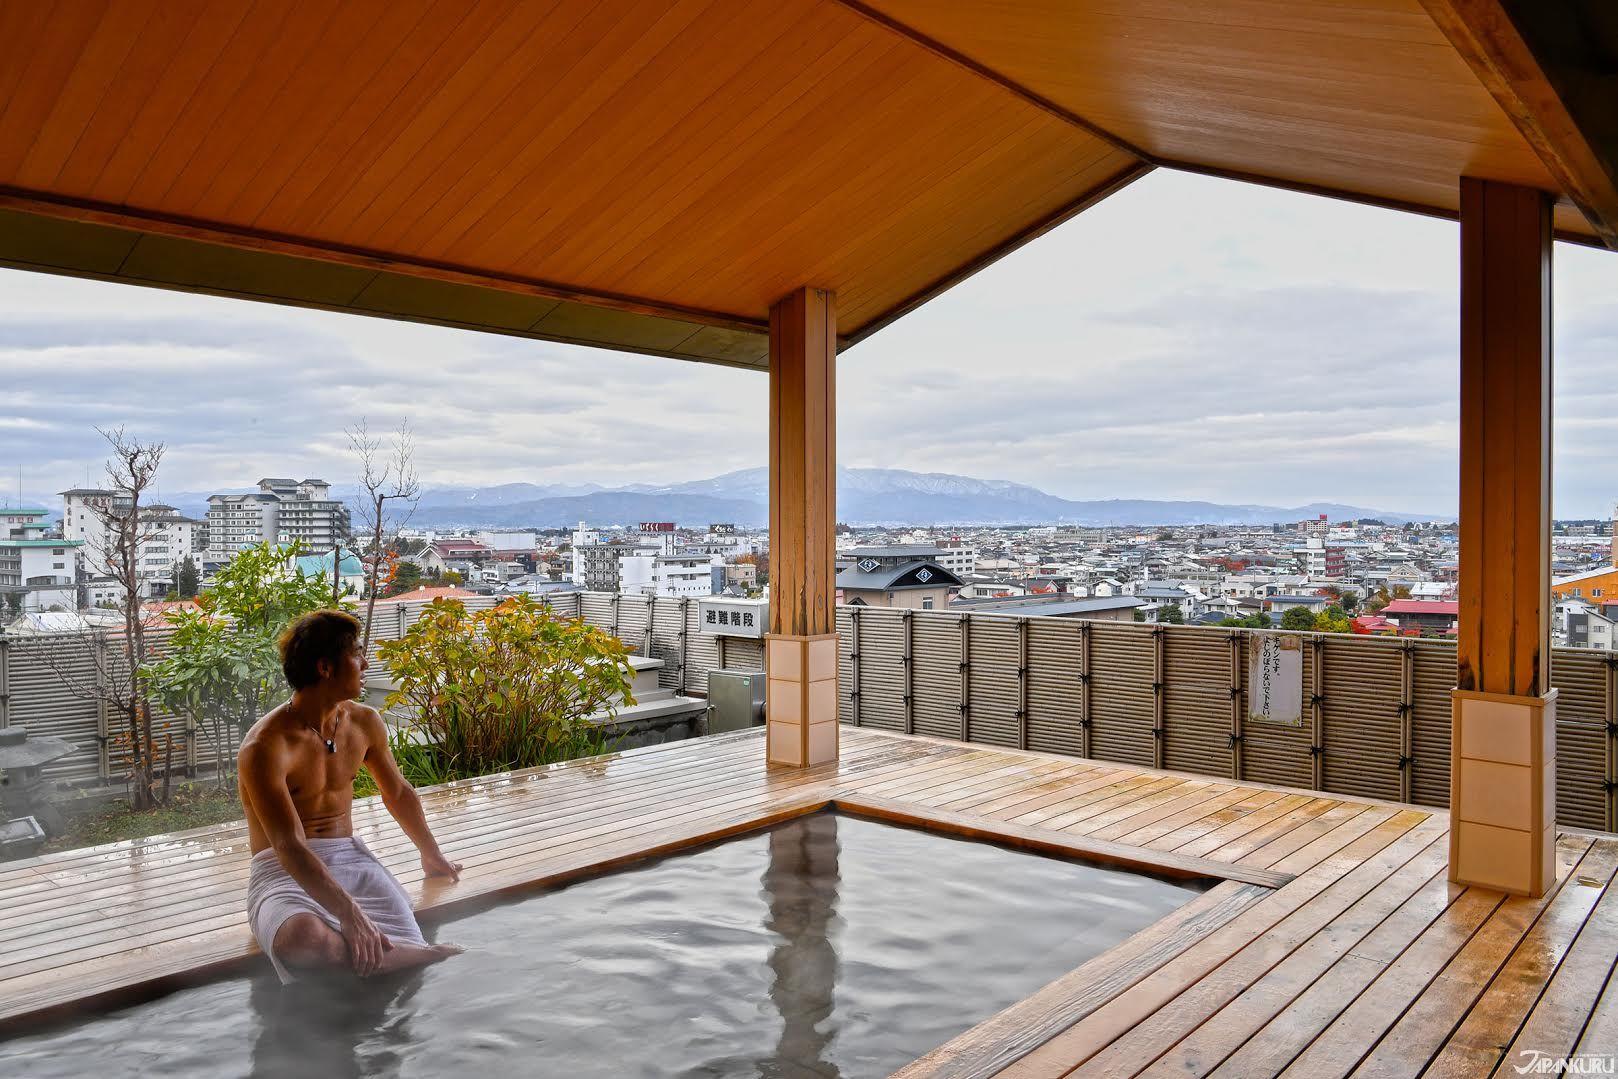 OMG !! City view Onsen in Yamagata tendo ♨️ #japan #japantrip #japantravel #yamagata #tendo #sakaeyahotel #onsen #beatiful #nikon #d5 #japaneseculture